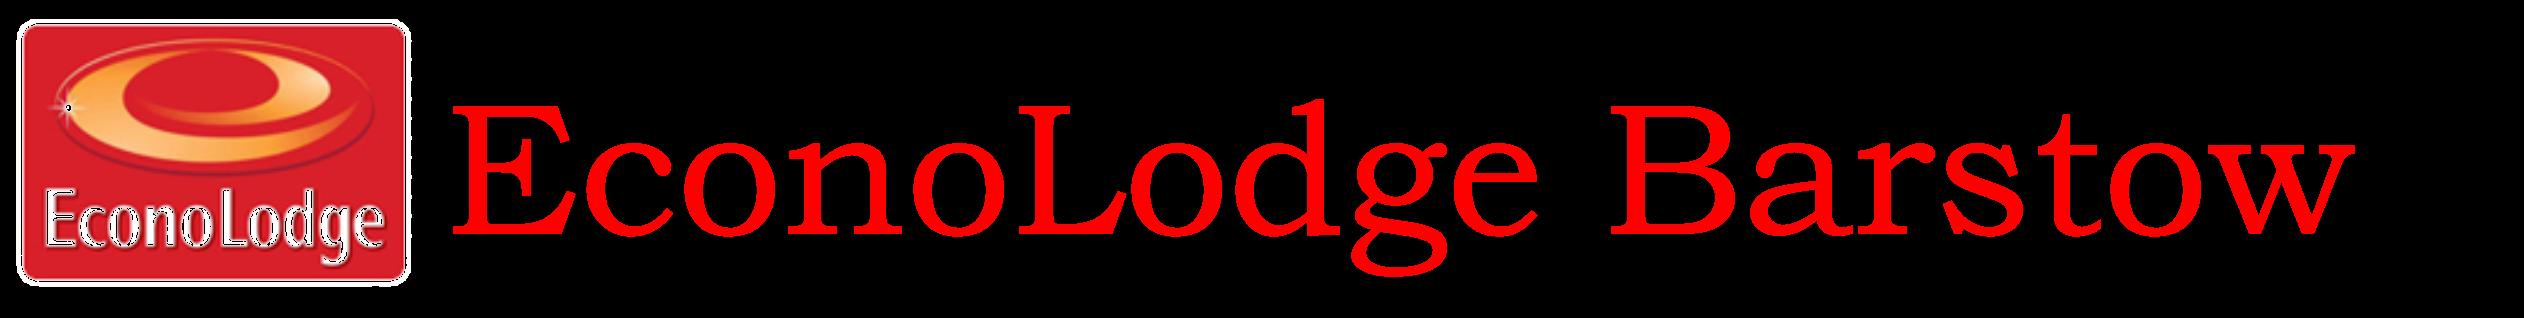 Econolodge Barstow